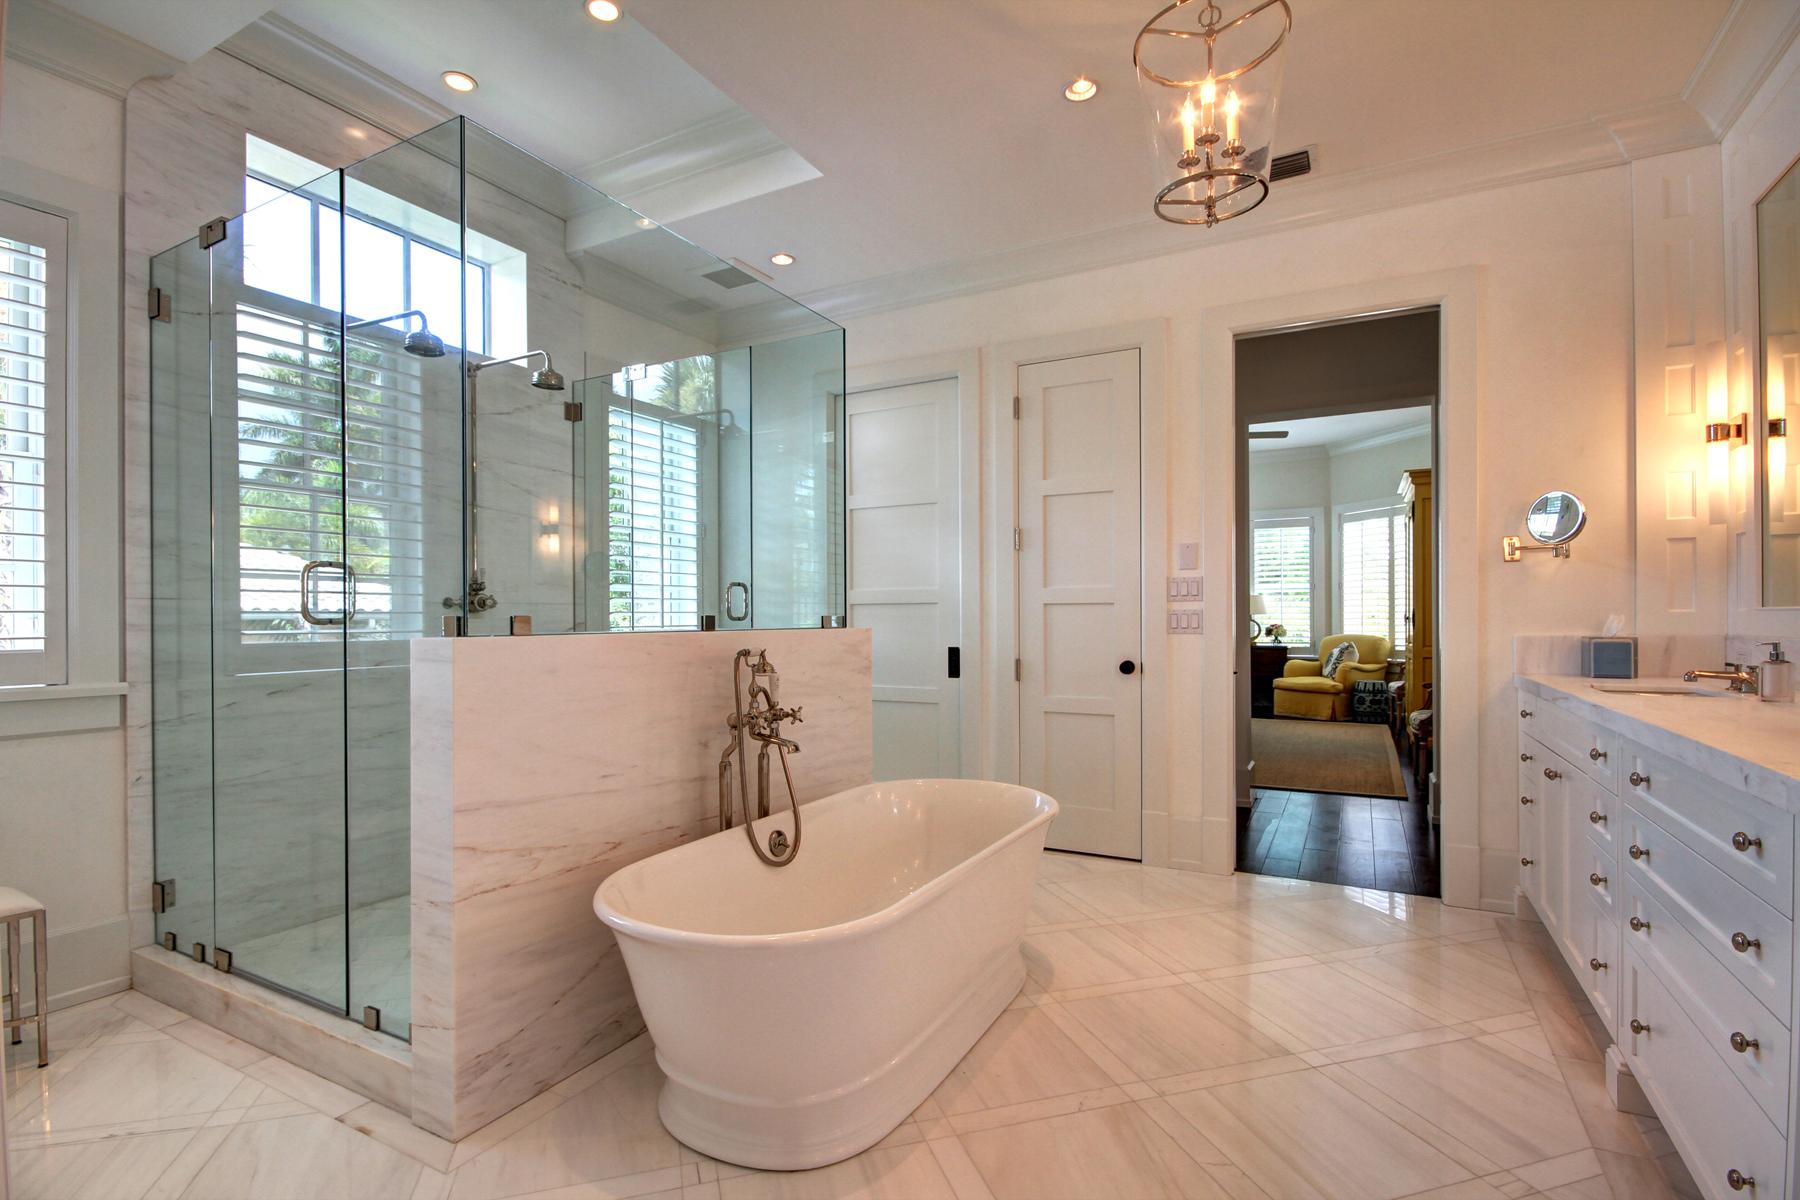 naples bathroom design